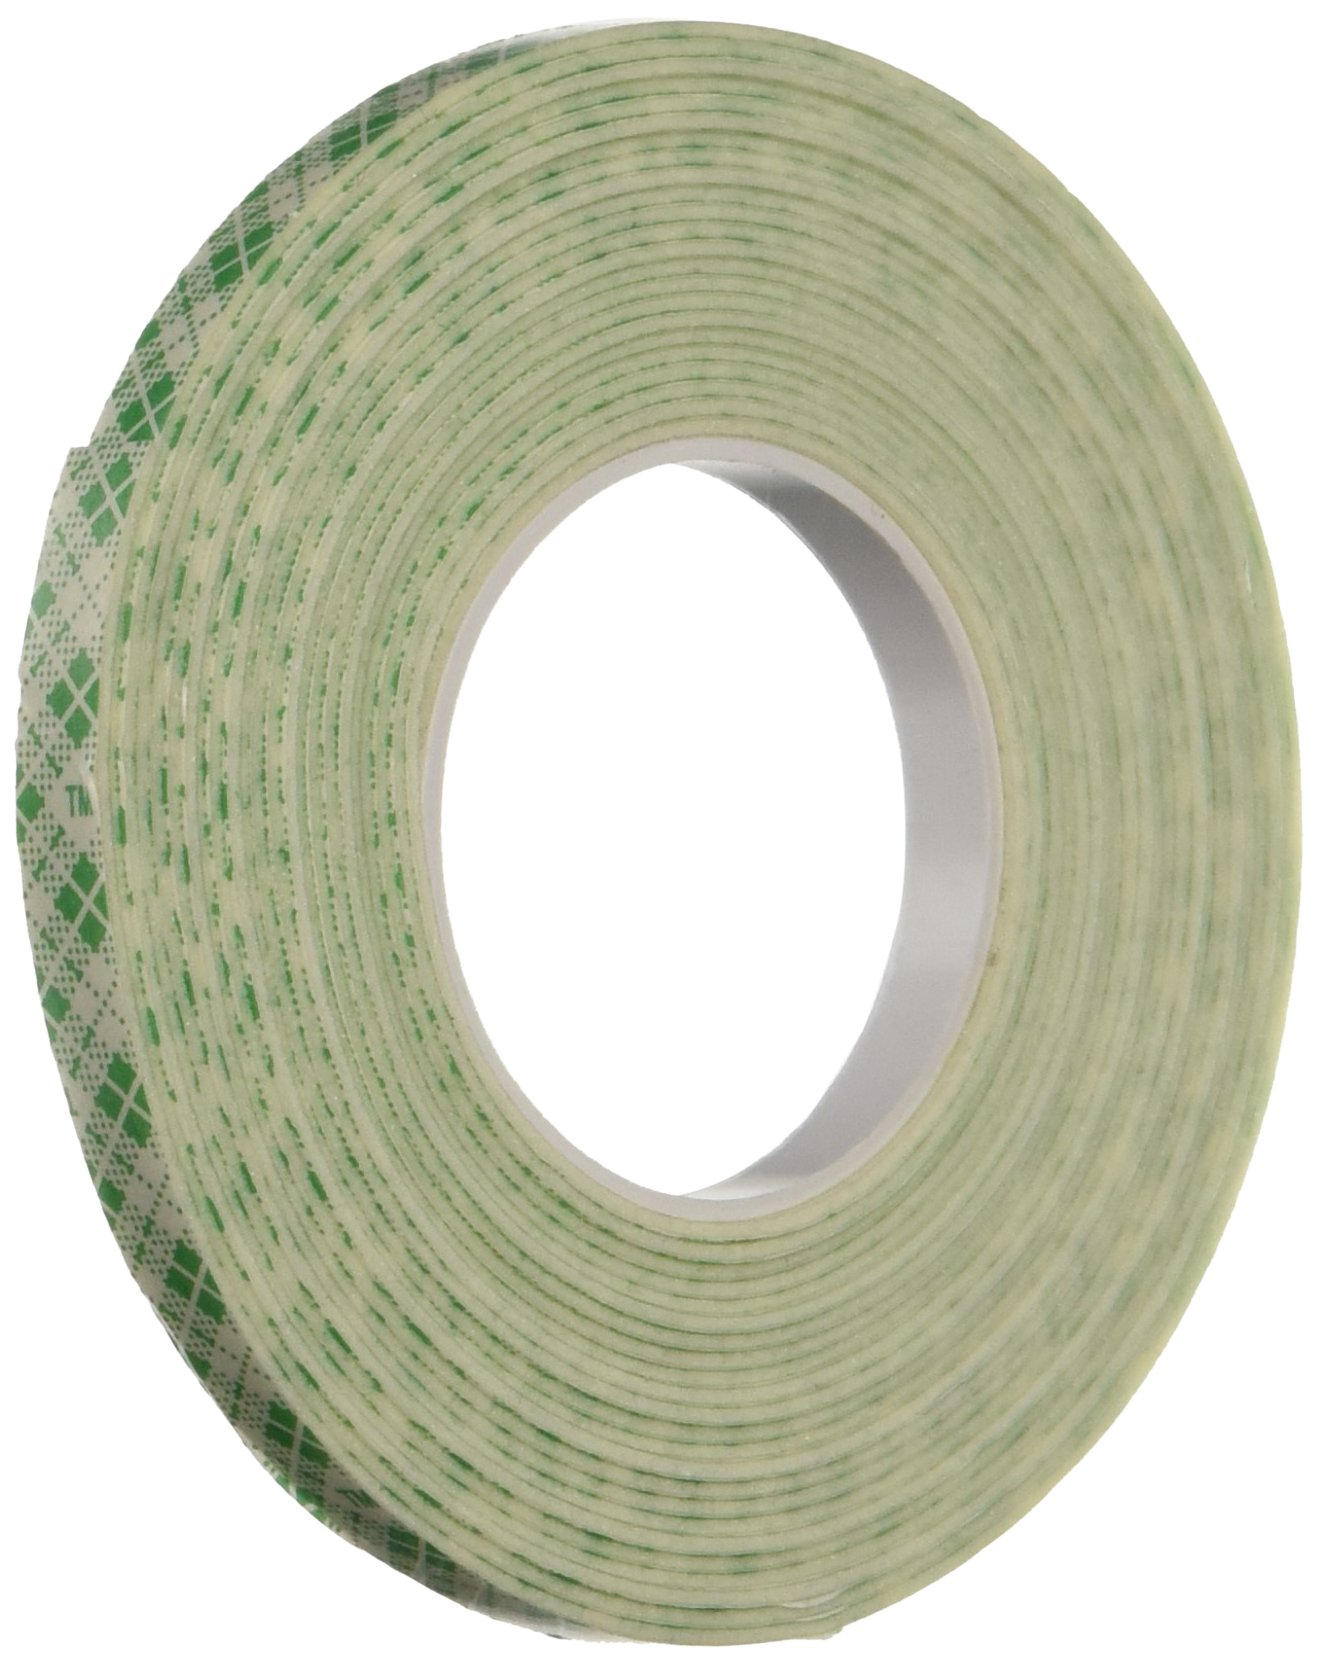 3M 4032 Natural Polyurethane Double Coated Foam